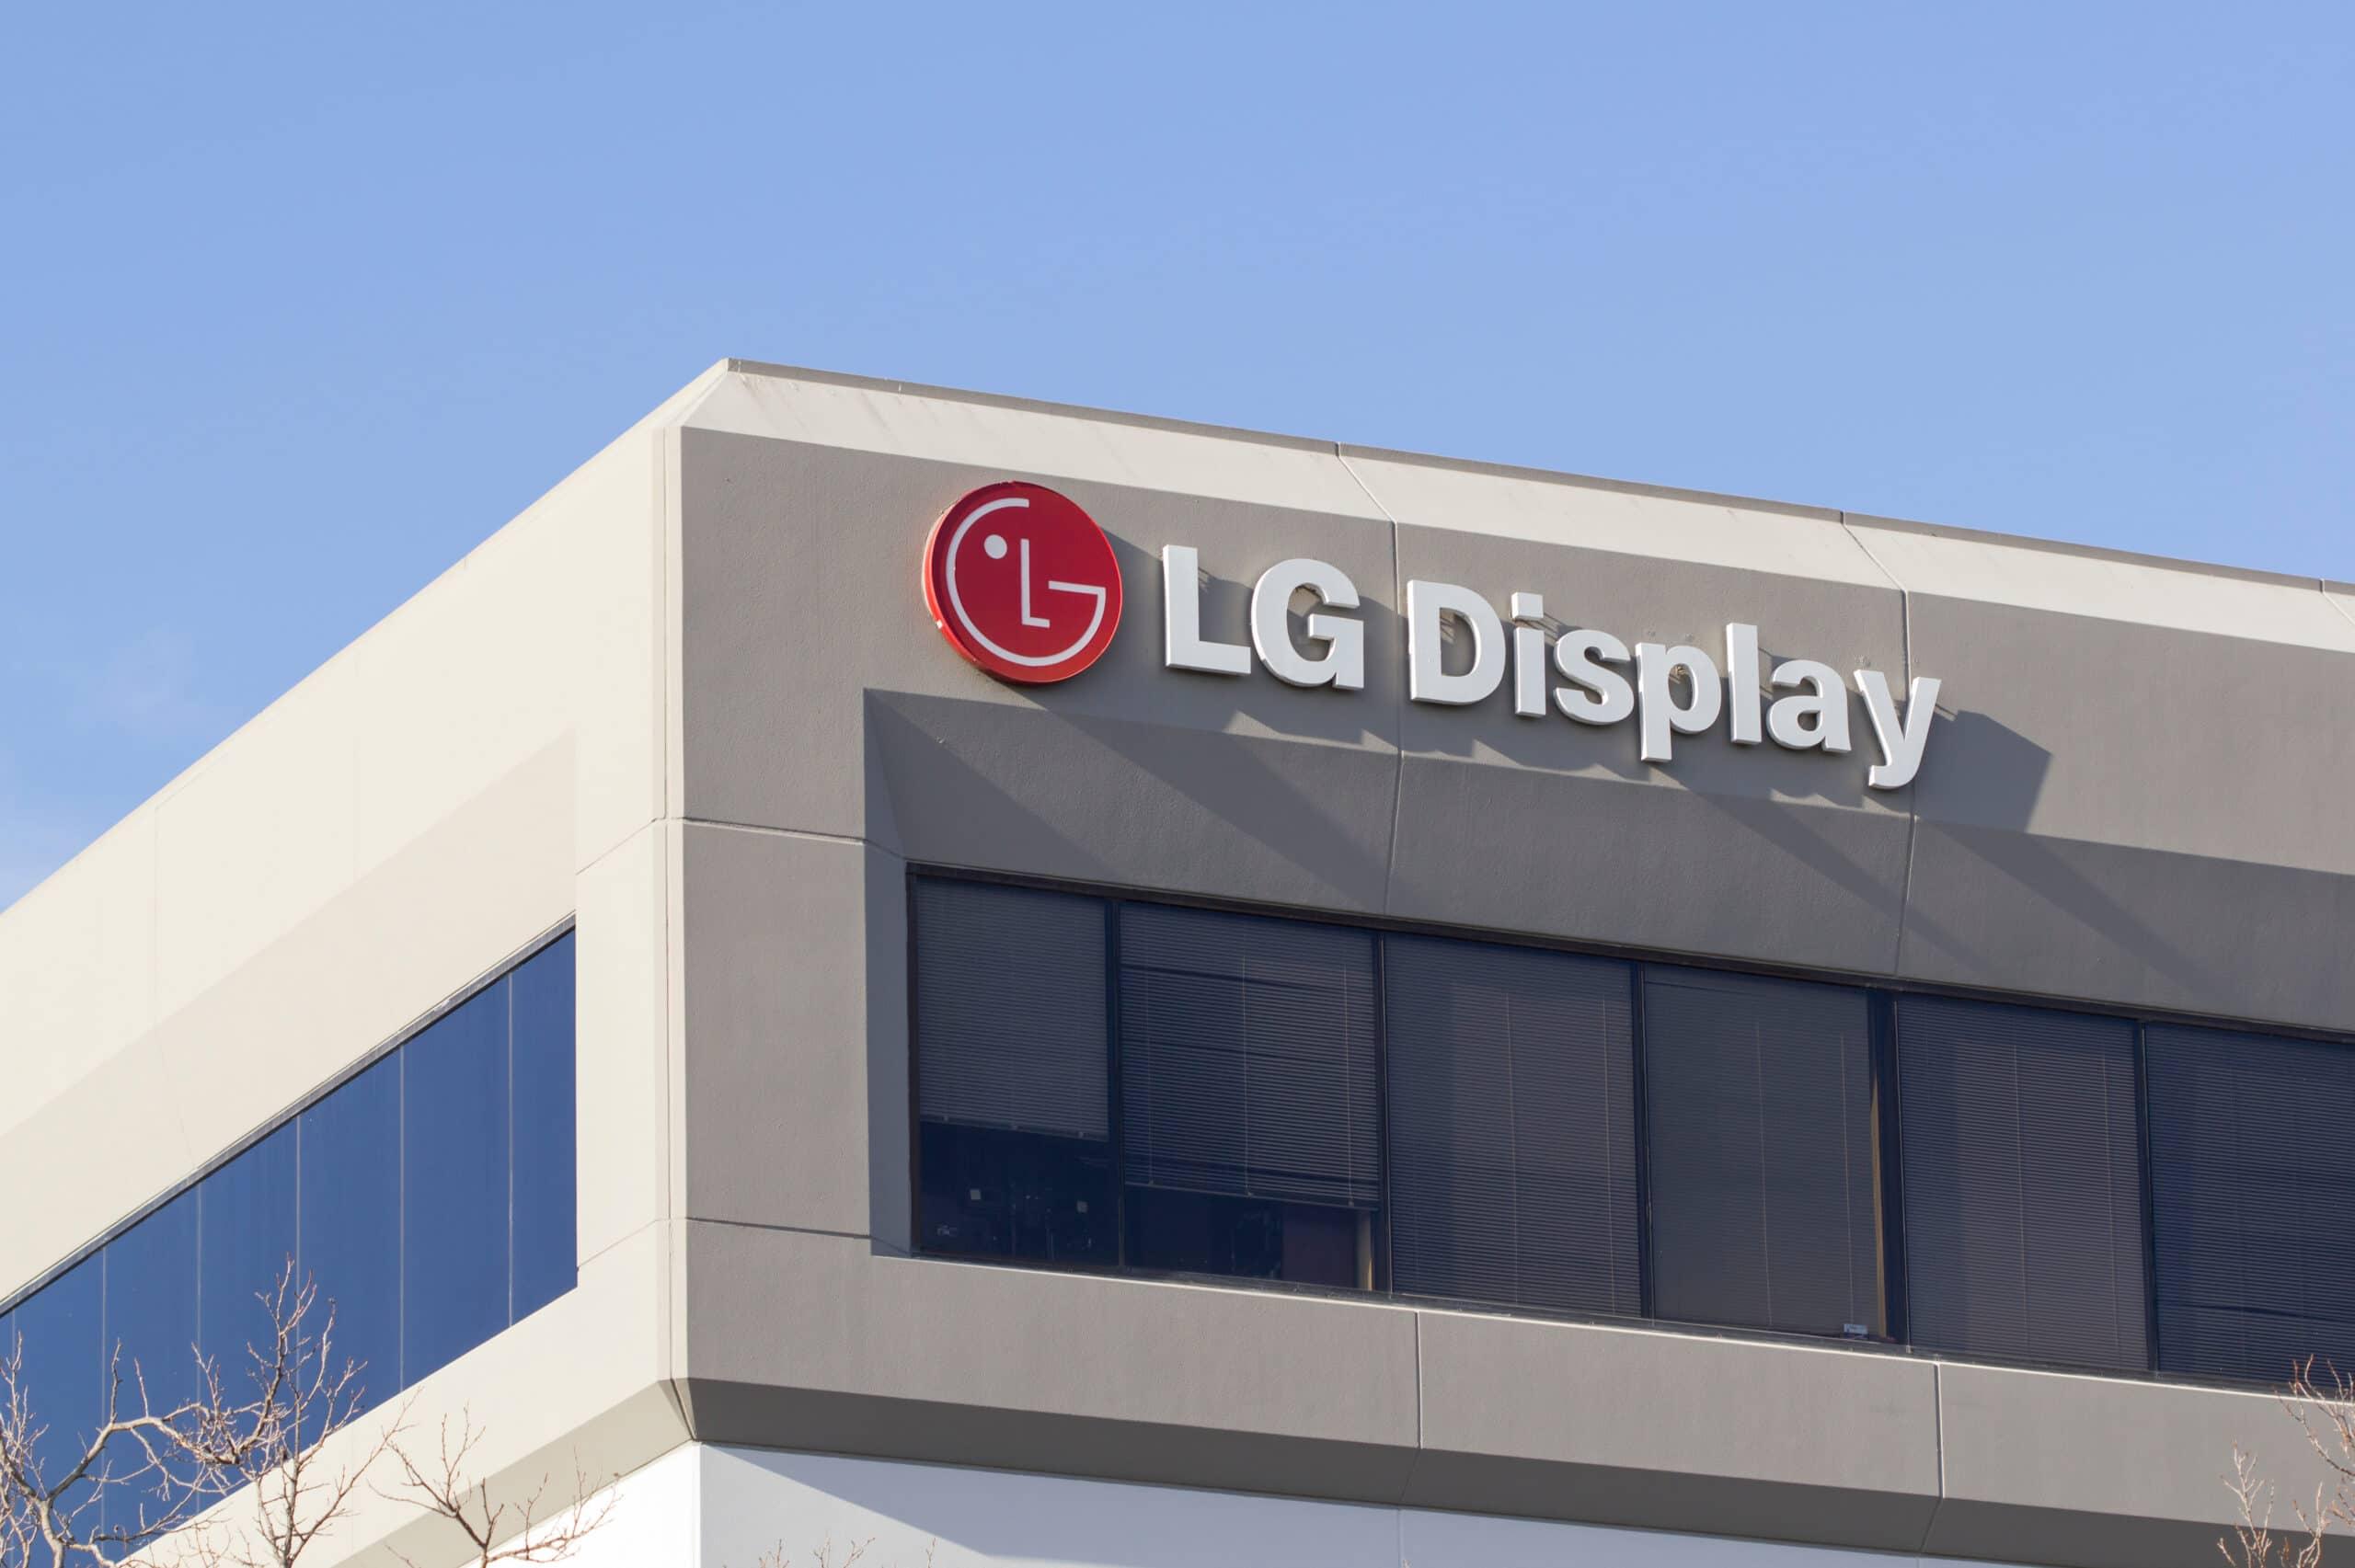 Fábrica da LG Display em San Jose, na Califórnia